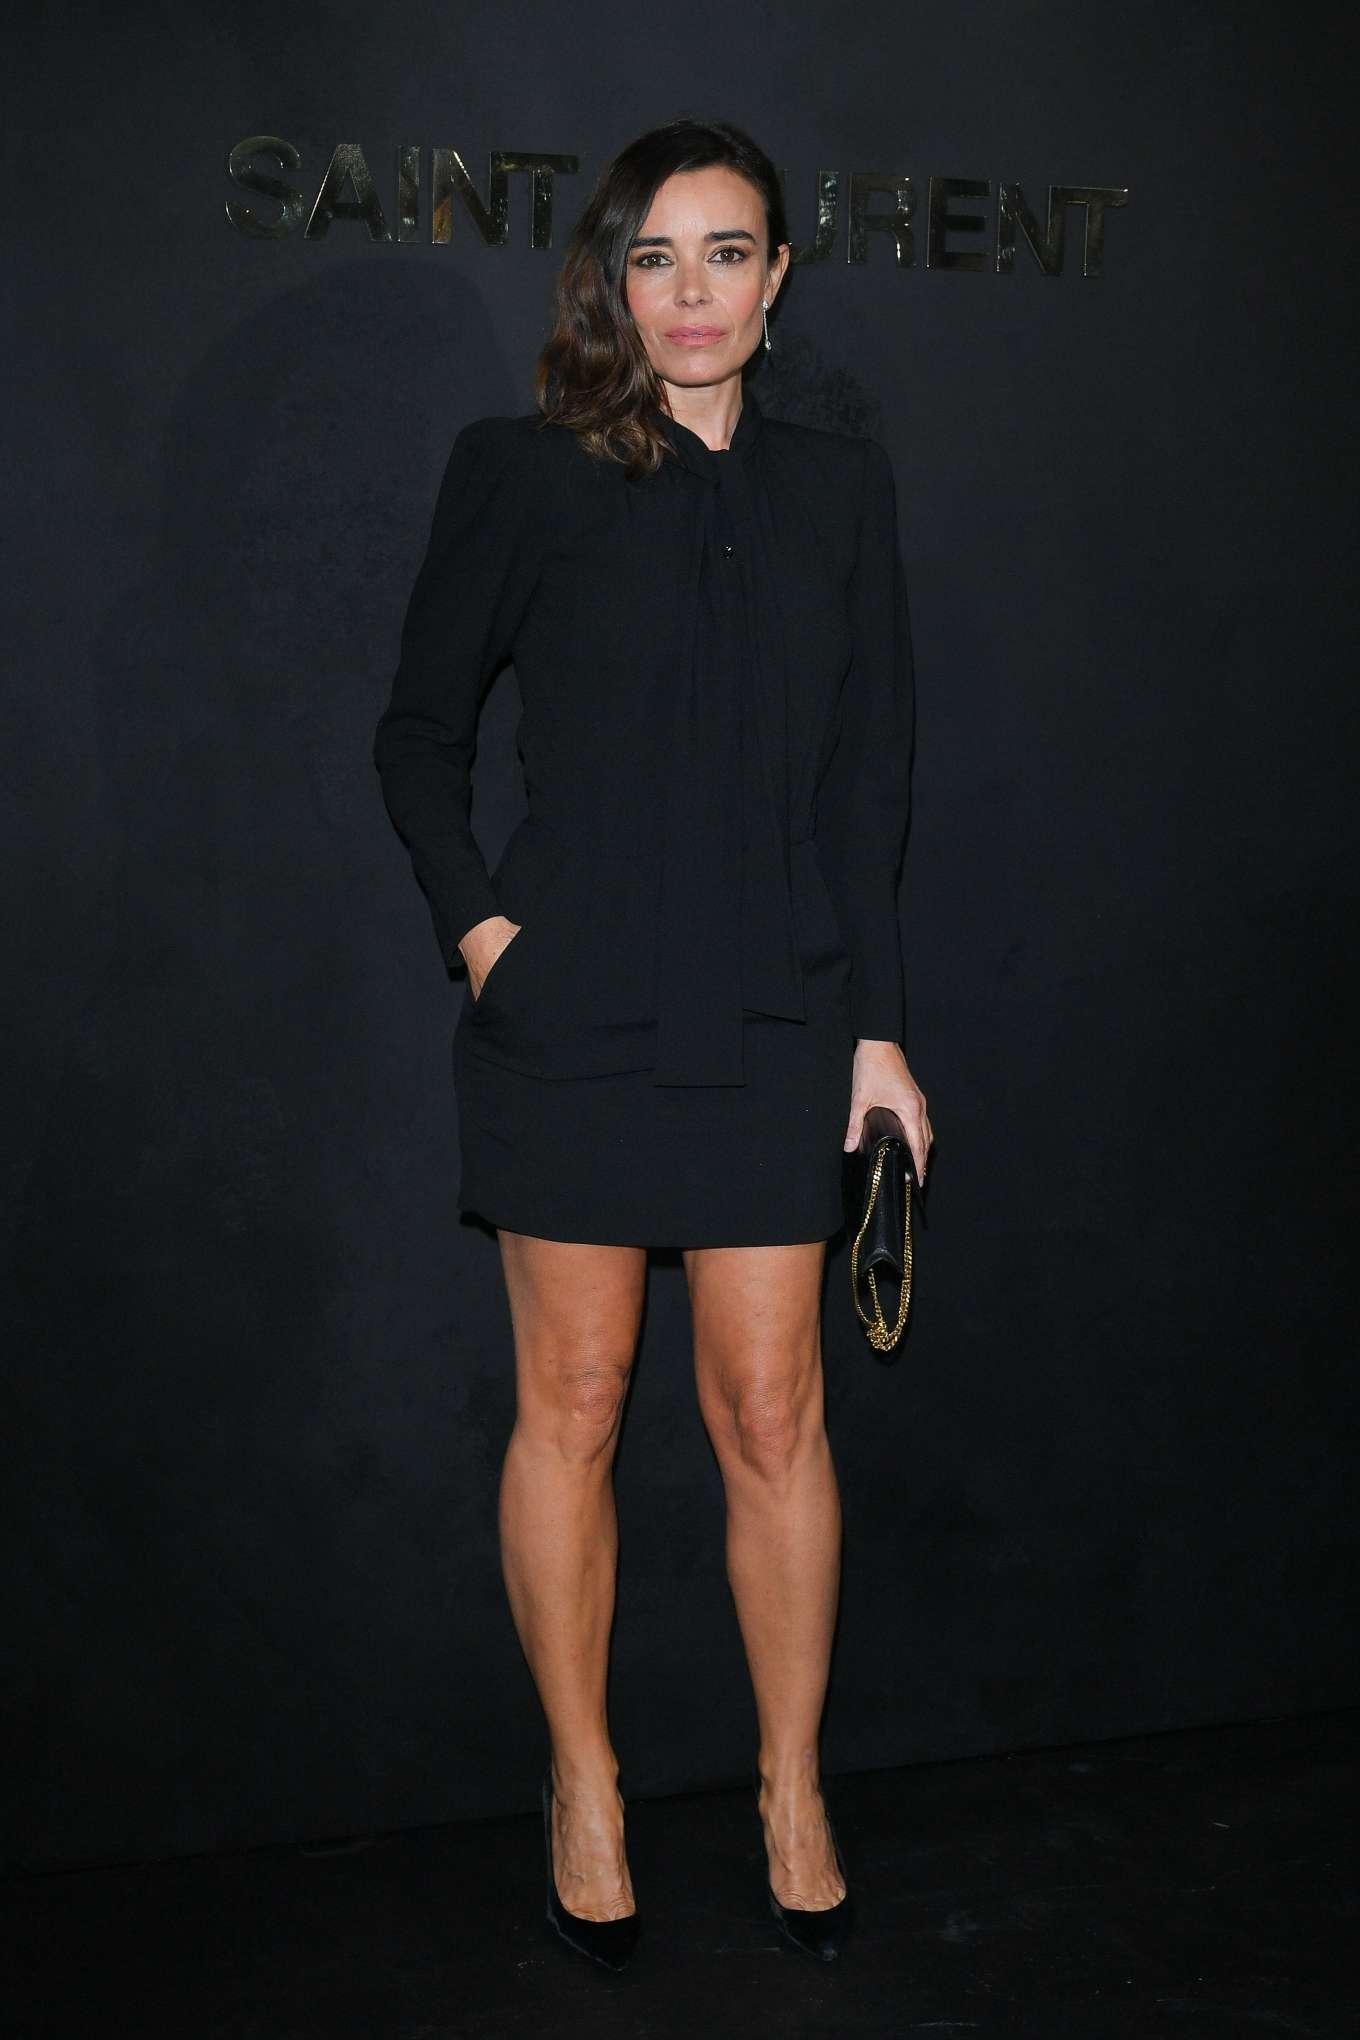 Elodie Bouchez 2019 : Elodie Bouchez – Saint Laurent Womenswear SS 2020 Show at Paris Fashion Week-14